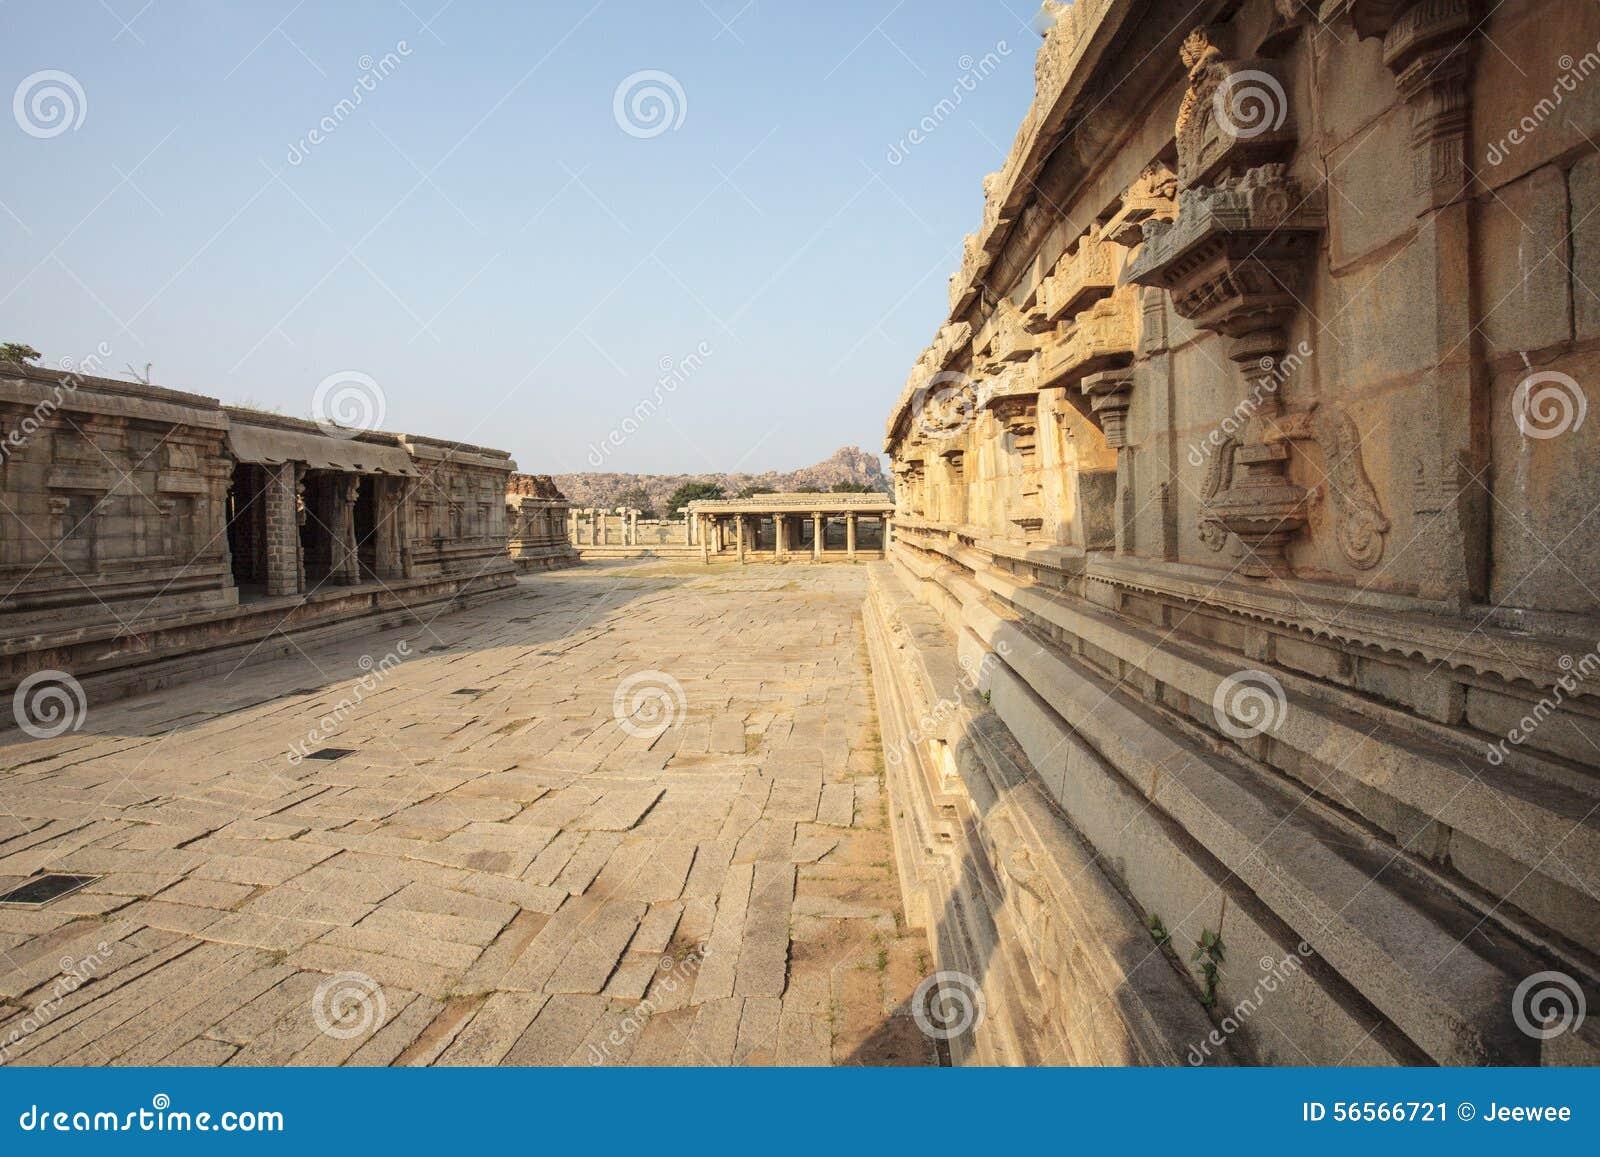 Download Μέσα στον ινδό ναό Vittala στην αρχαία περιοχή Hampi, Karnataka, Ινδία Στοκ Εικόνα - εικόνα από άρμα, hinduism: 56566721